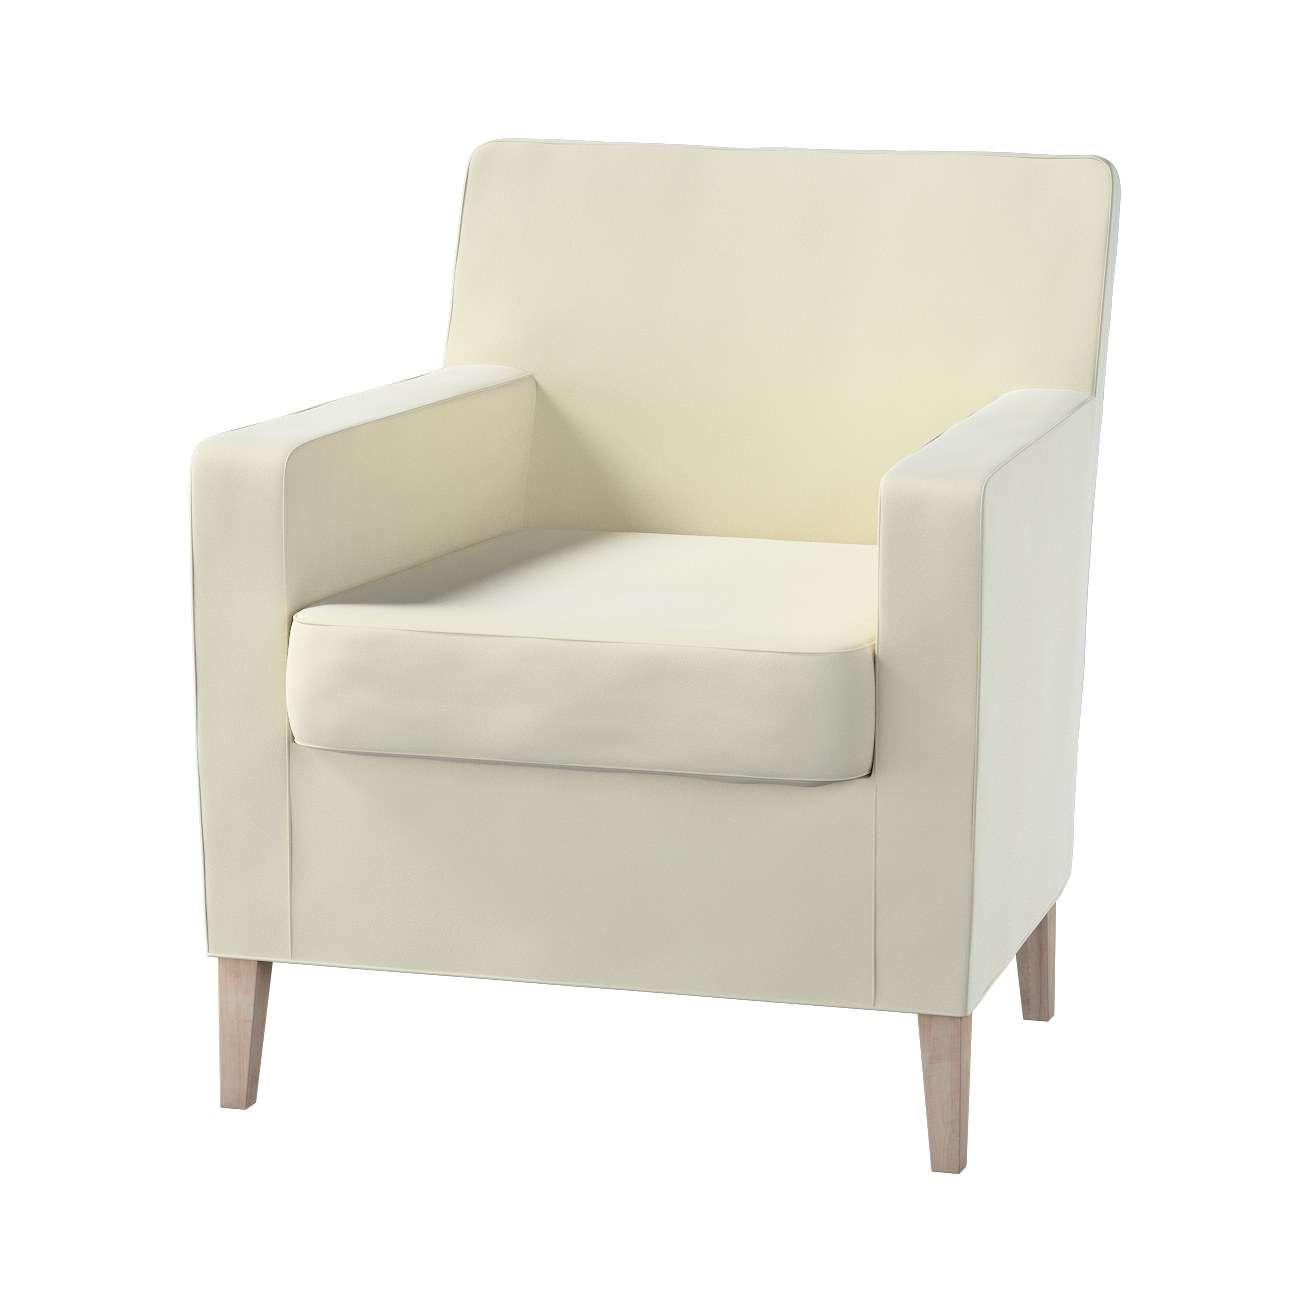 Pokrowiec na fotel Karlstad w kolekcji Velvet, tkanina: 704-10